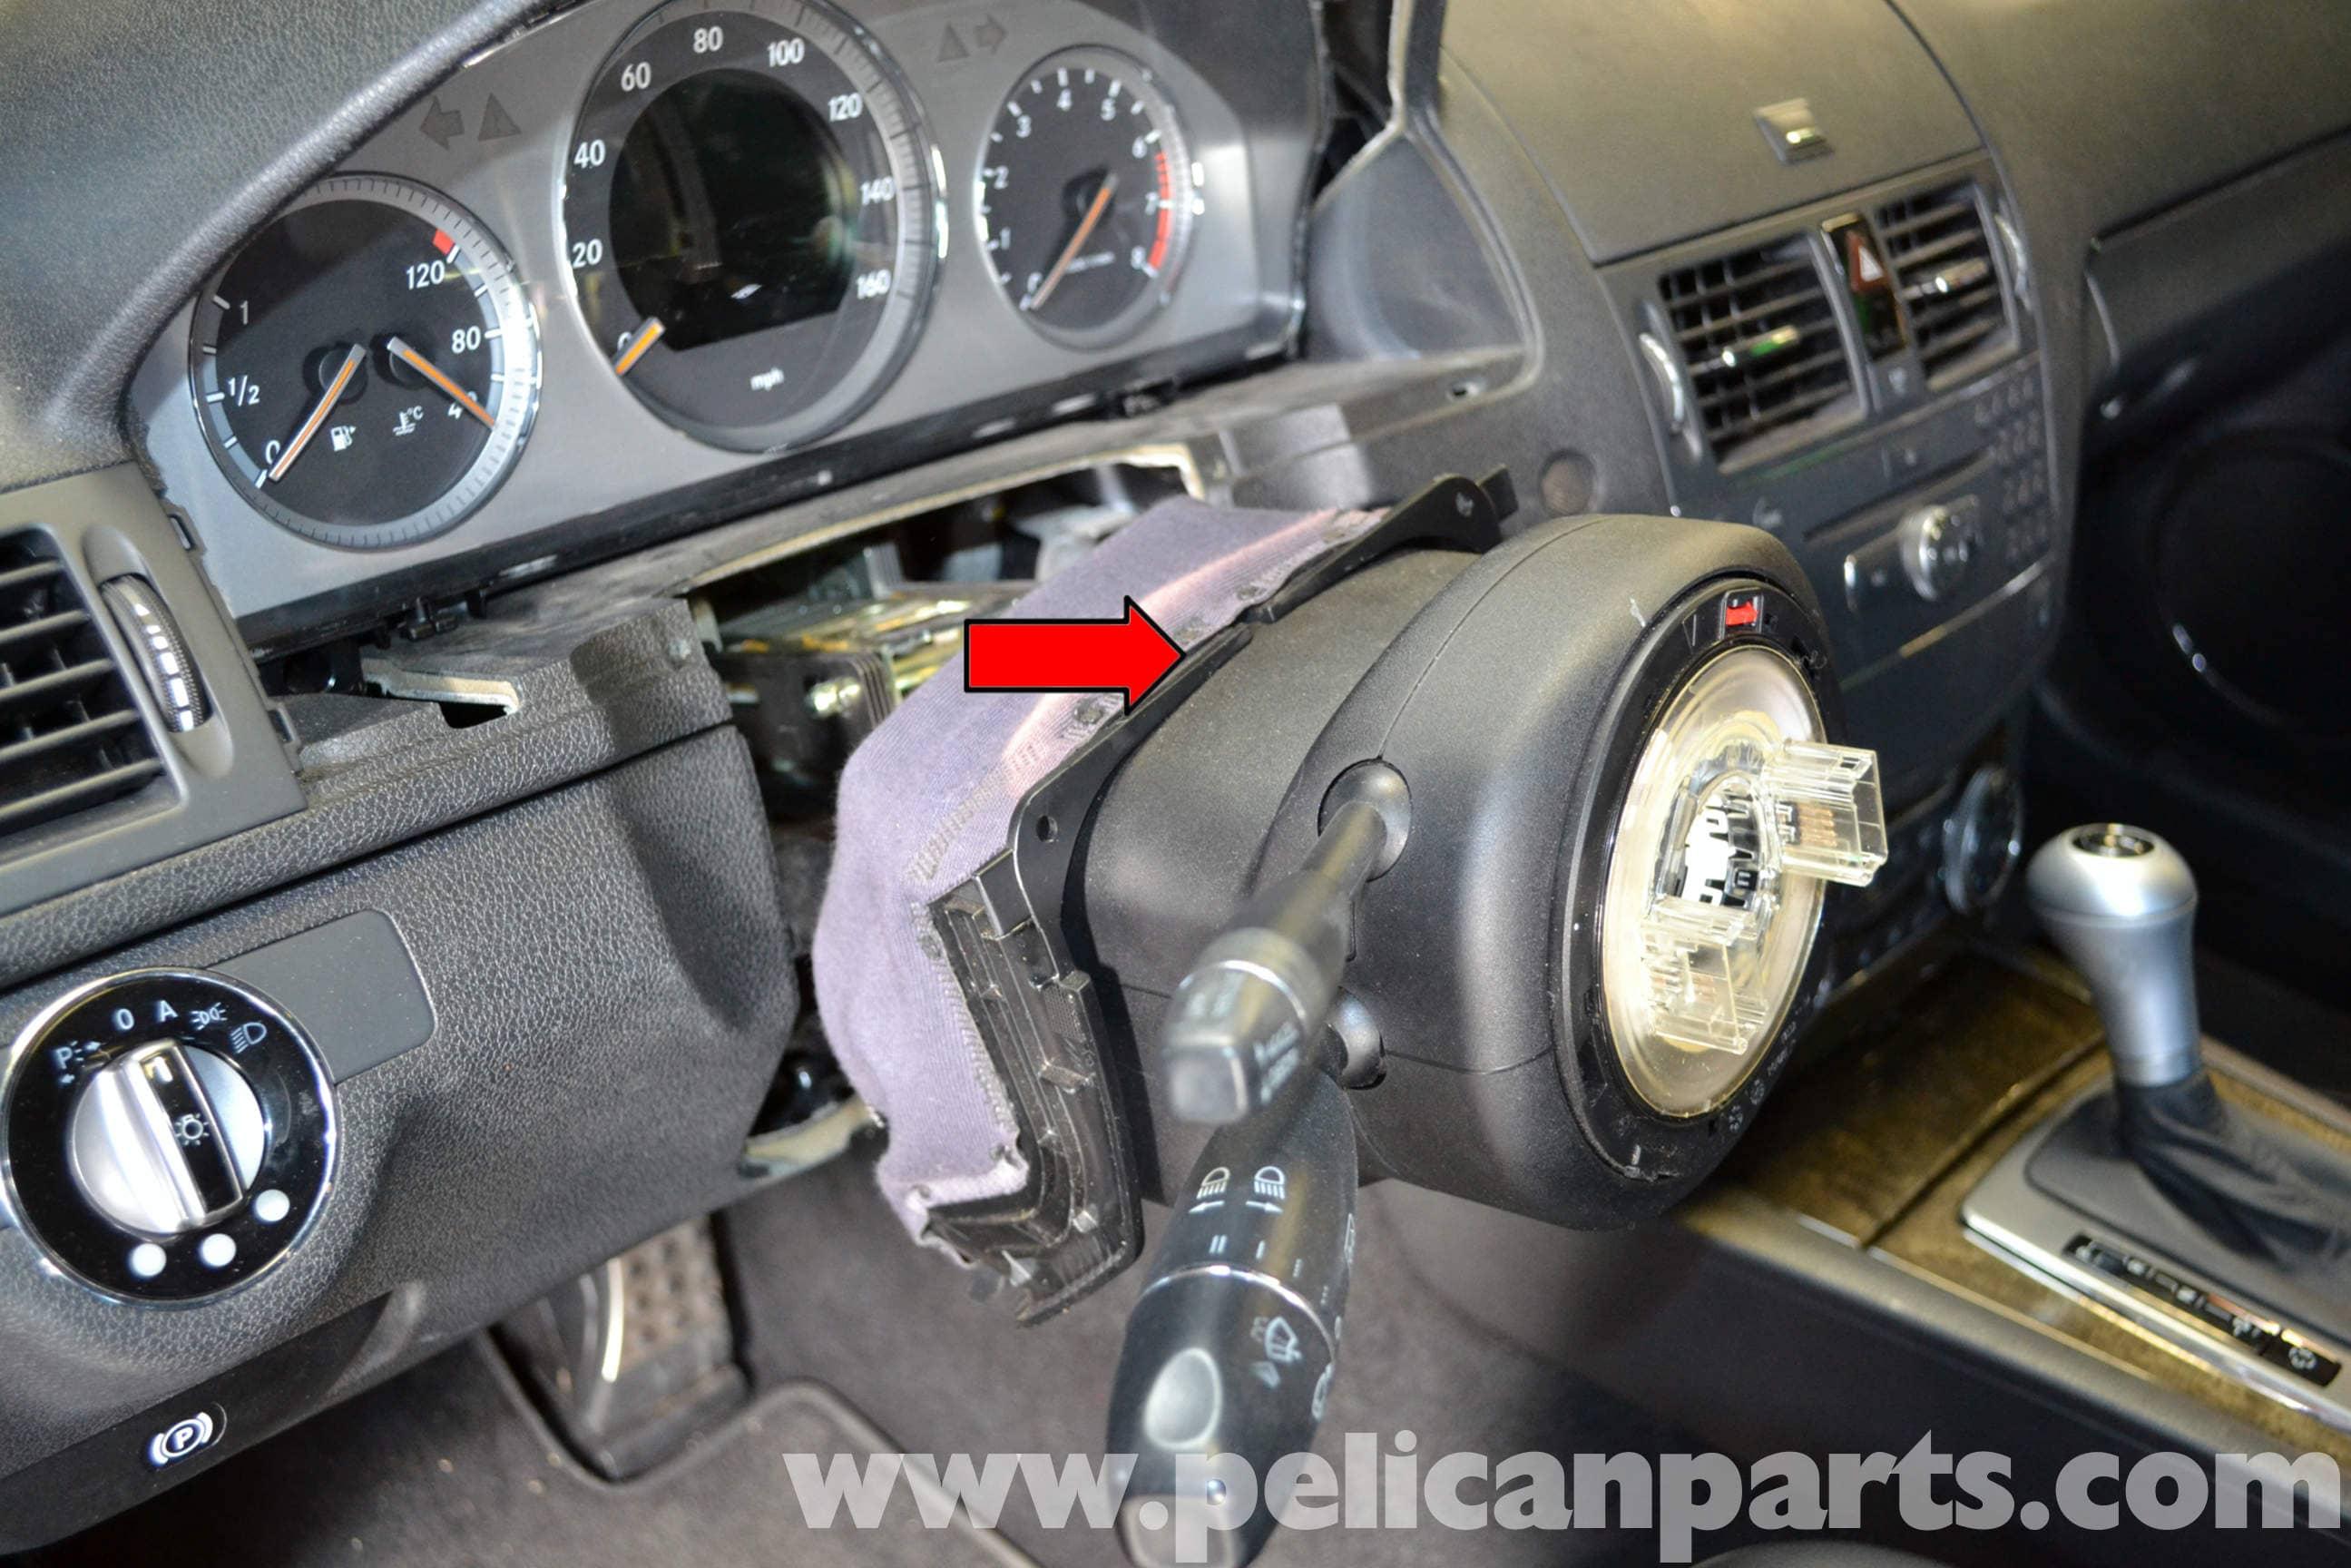 2013 Mercedes Benz C250 Coupe Fuse Box Diagram Mercedes Benz W204 Steering Column Switch Tube Module